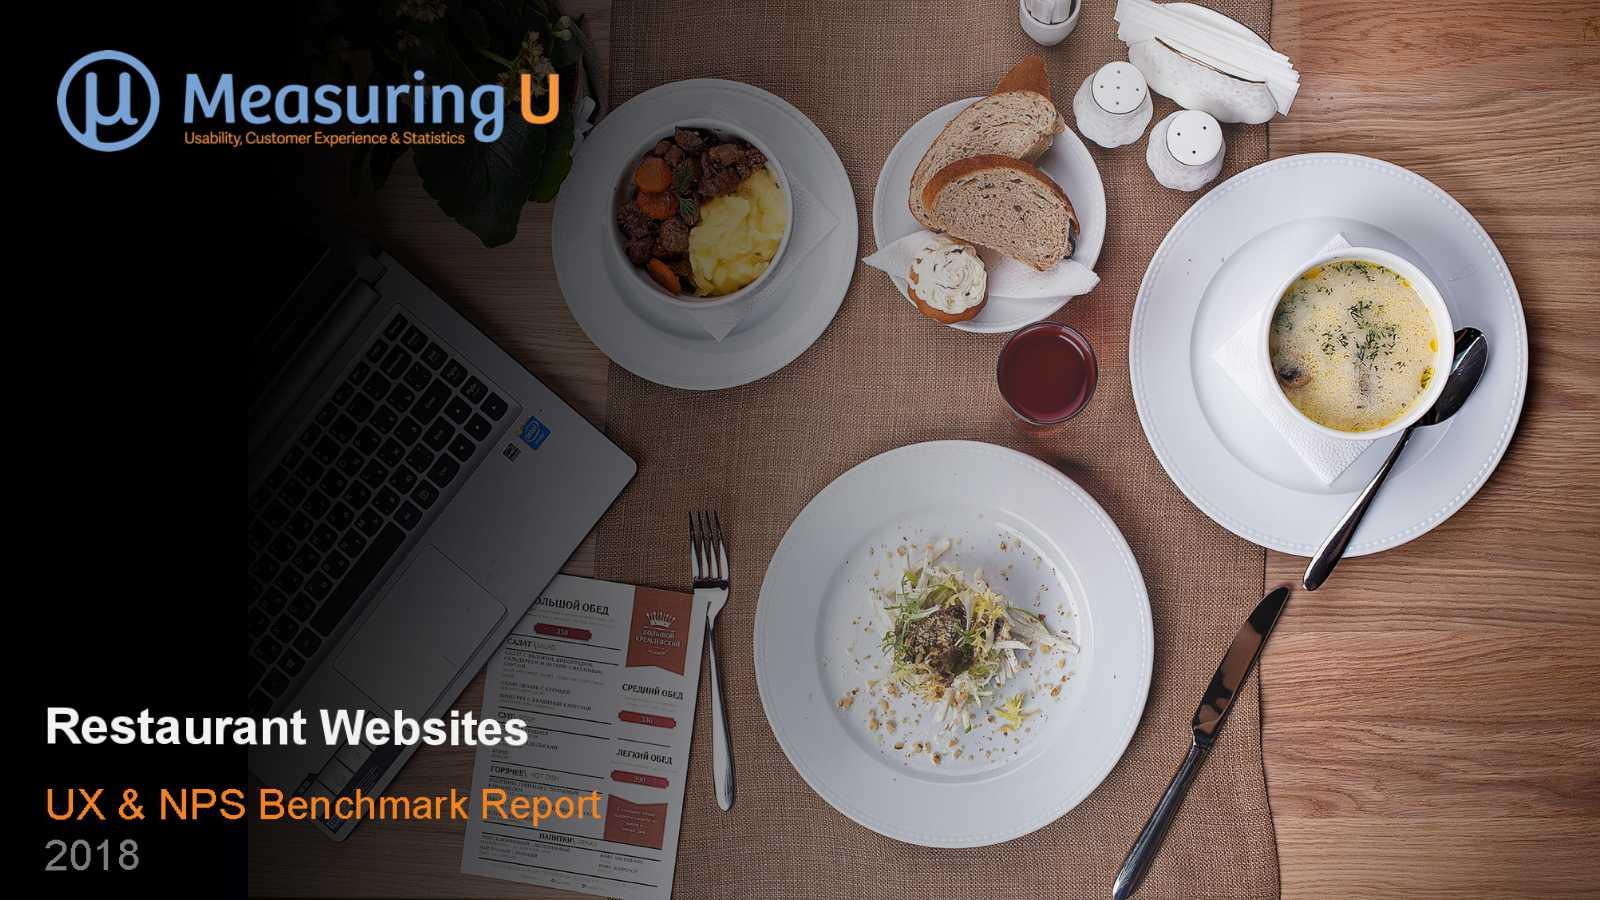 UX & Net Promoter Benchmark Report for Restaurant Websites